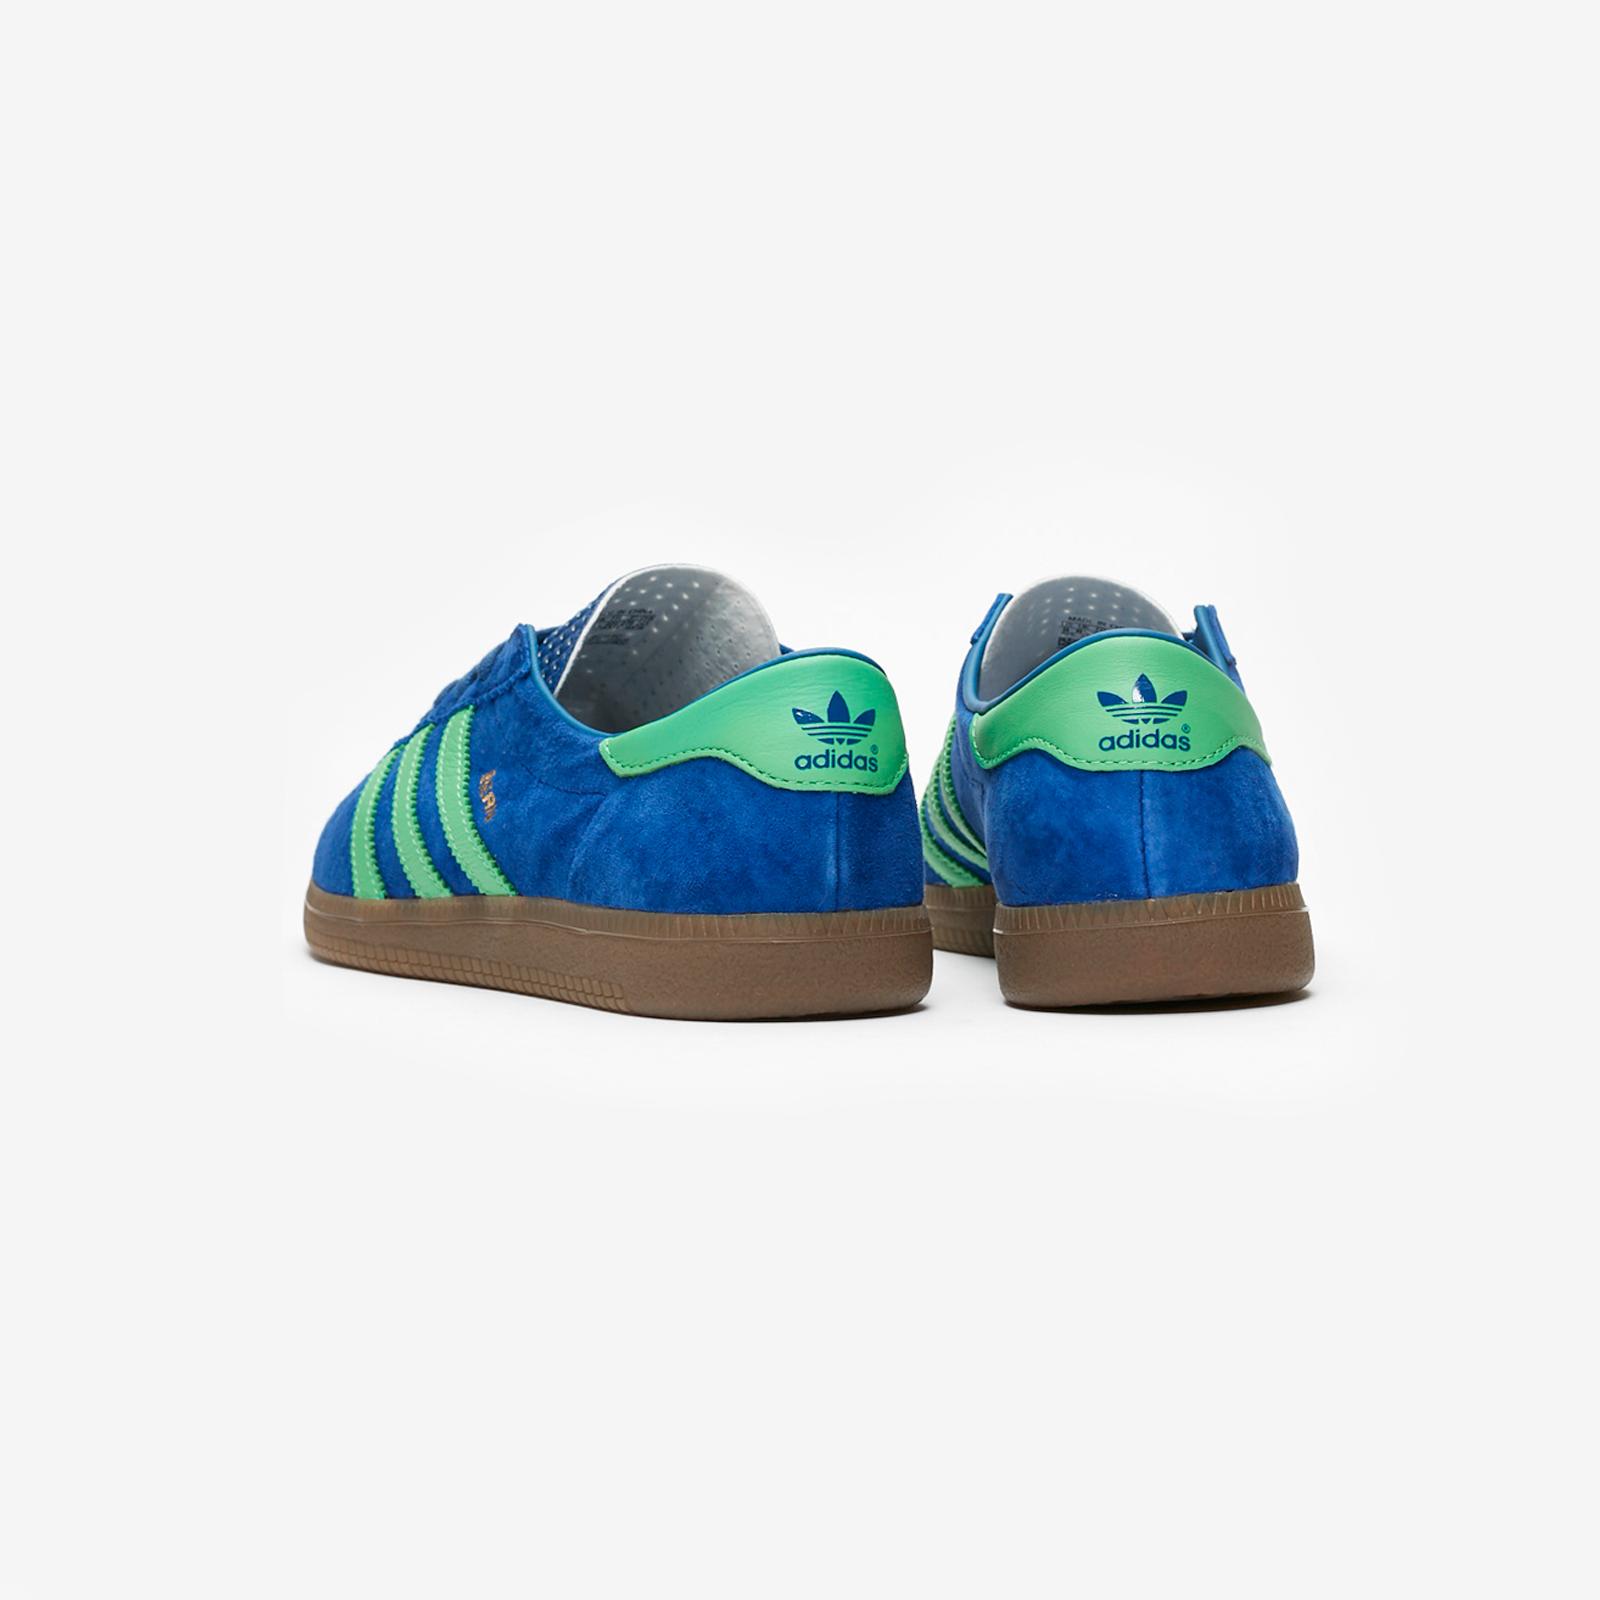 adidas Bern - Ee4927 - Sneakersnstuff